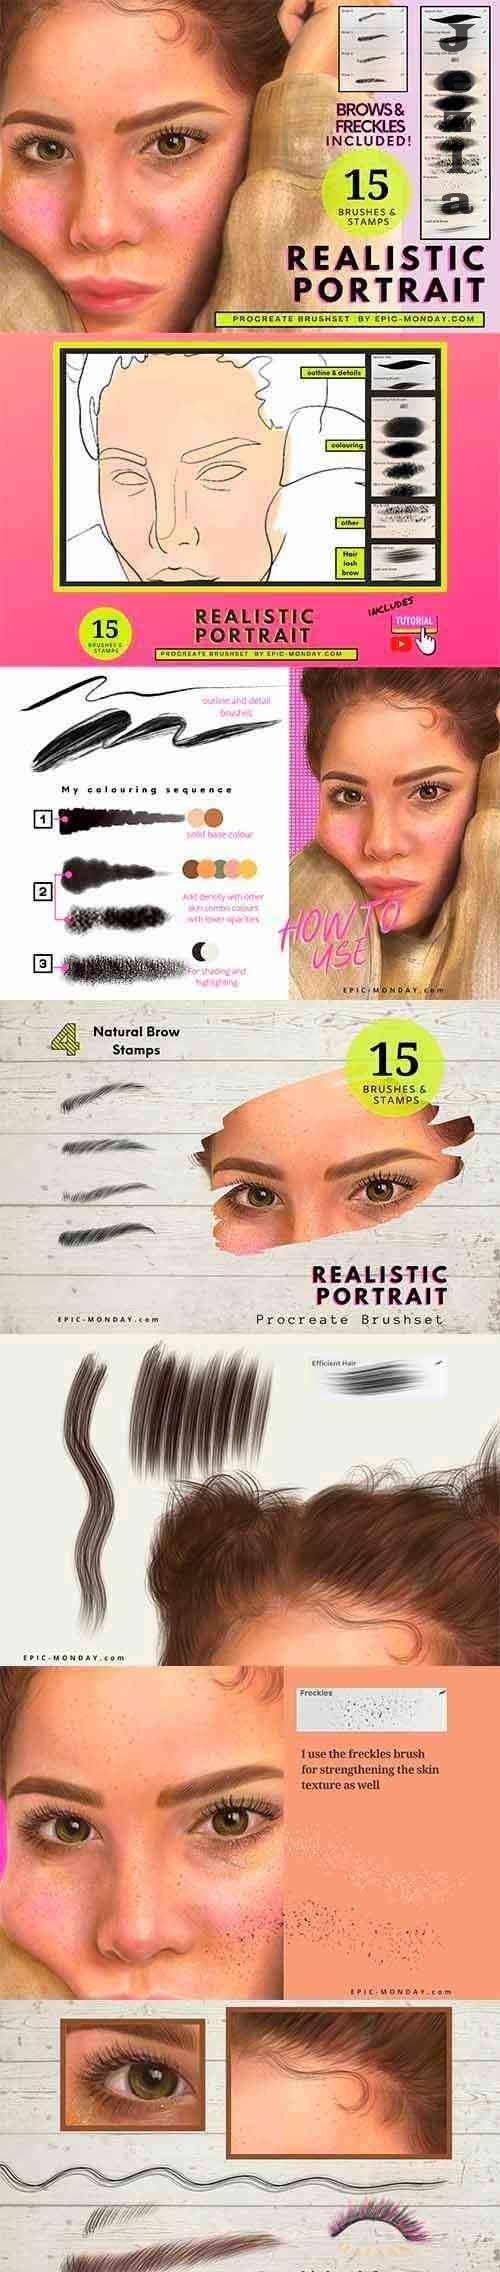 CreativeMarket - Procreate Realistic Portrait Brushes 5490552